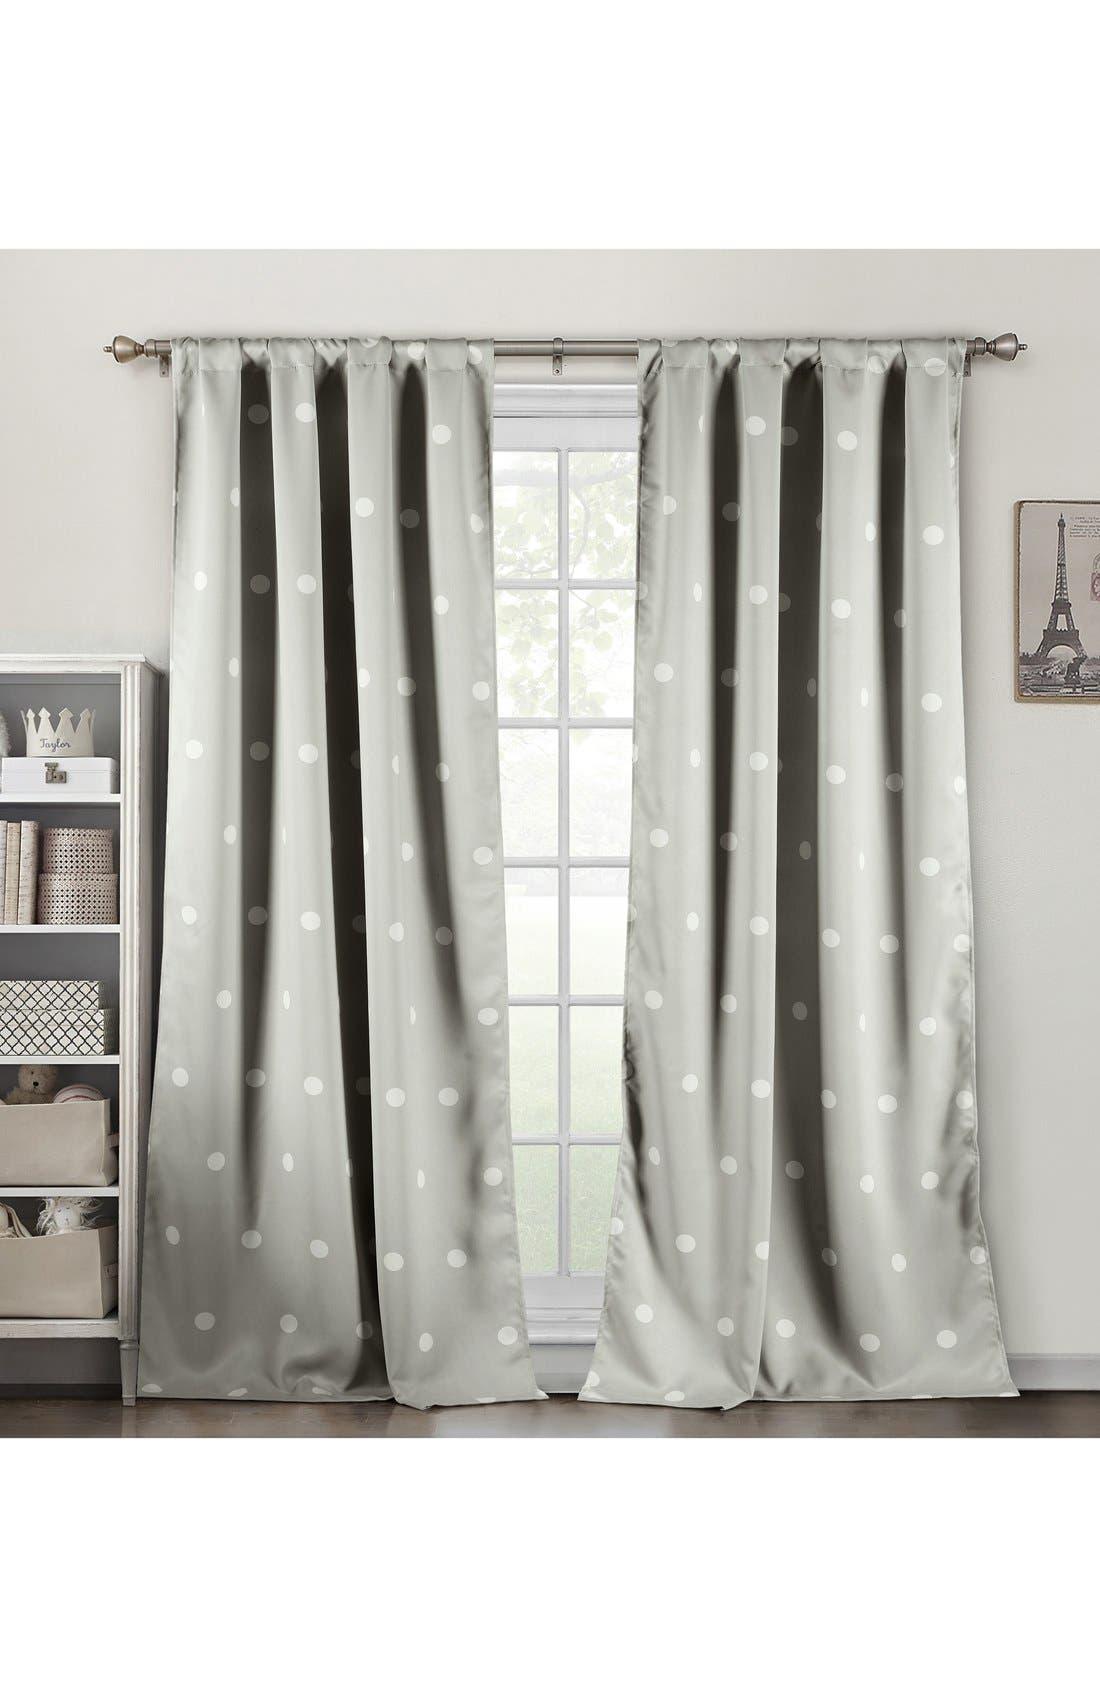 Main Image - LALA + BASH 'Dottie' Window Panels